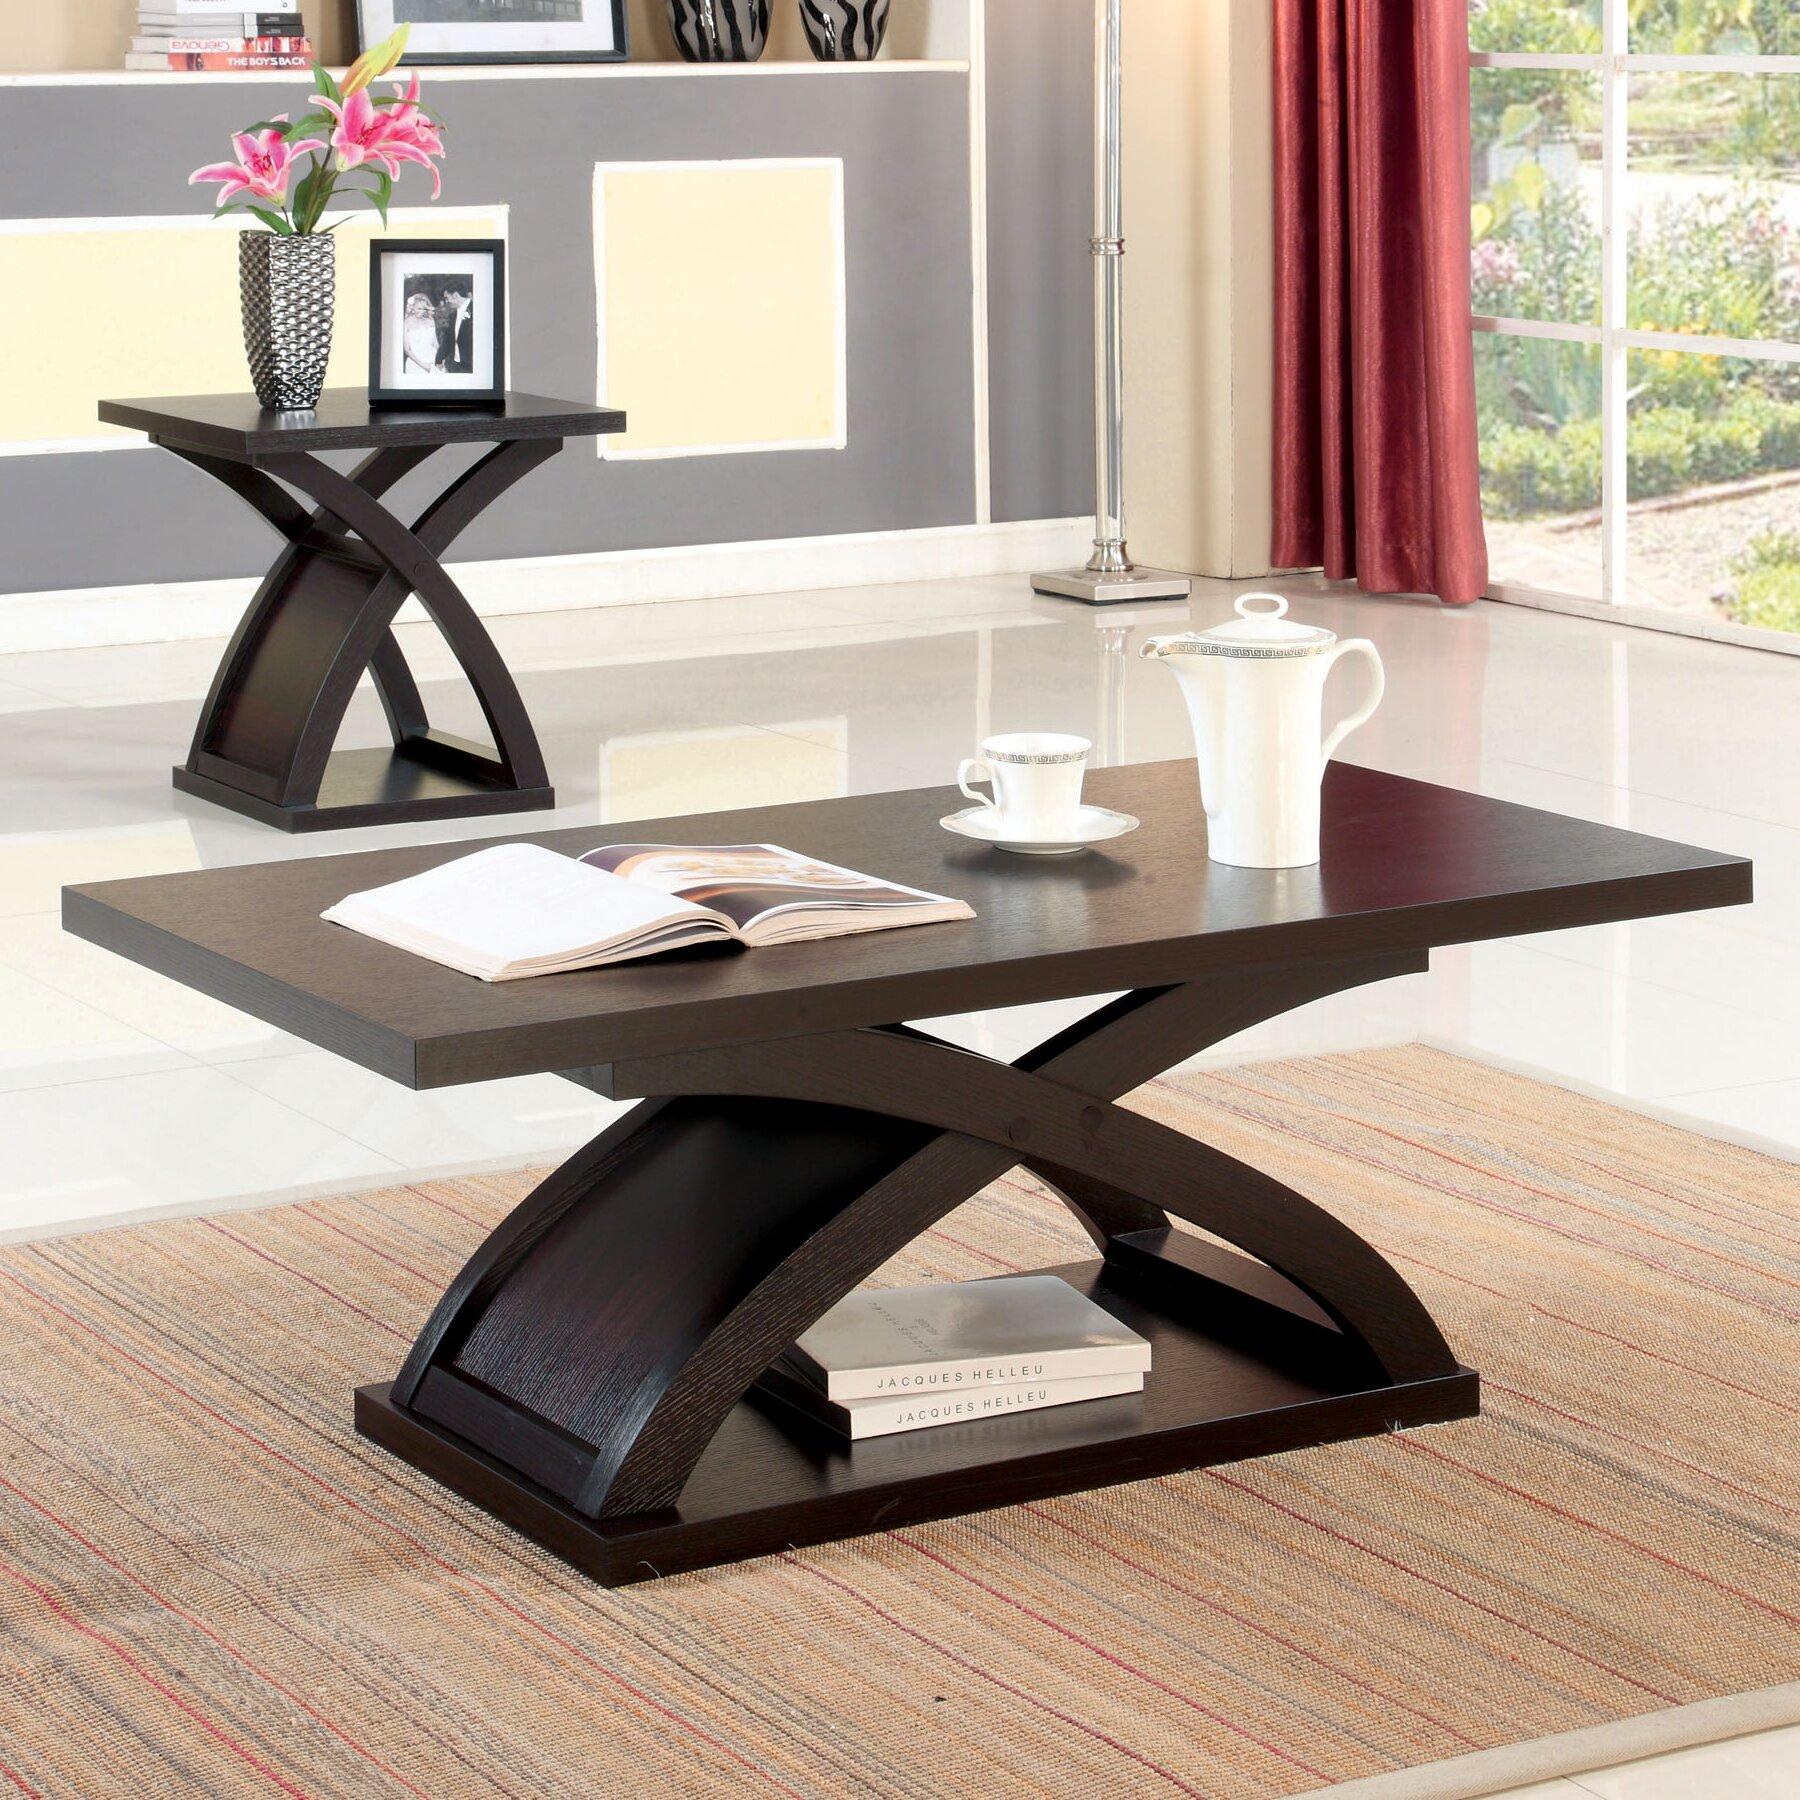 hokku designs gnarls coffee table reviews wayfair. Black Bedroom Furniture Sets. Home Design Ideas